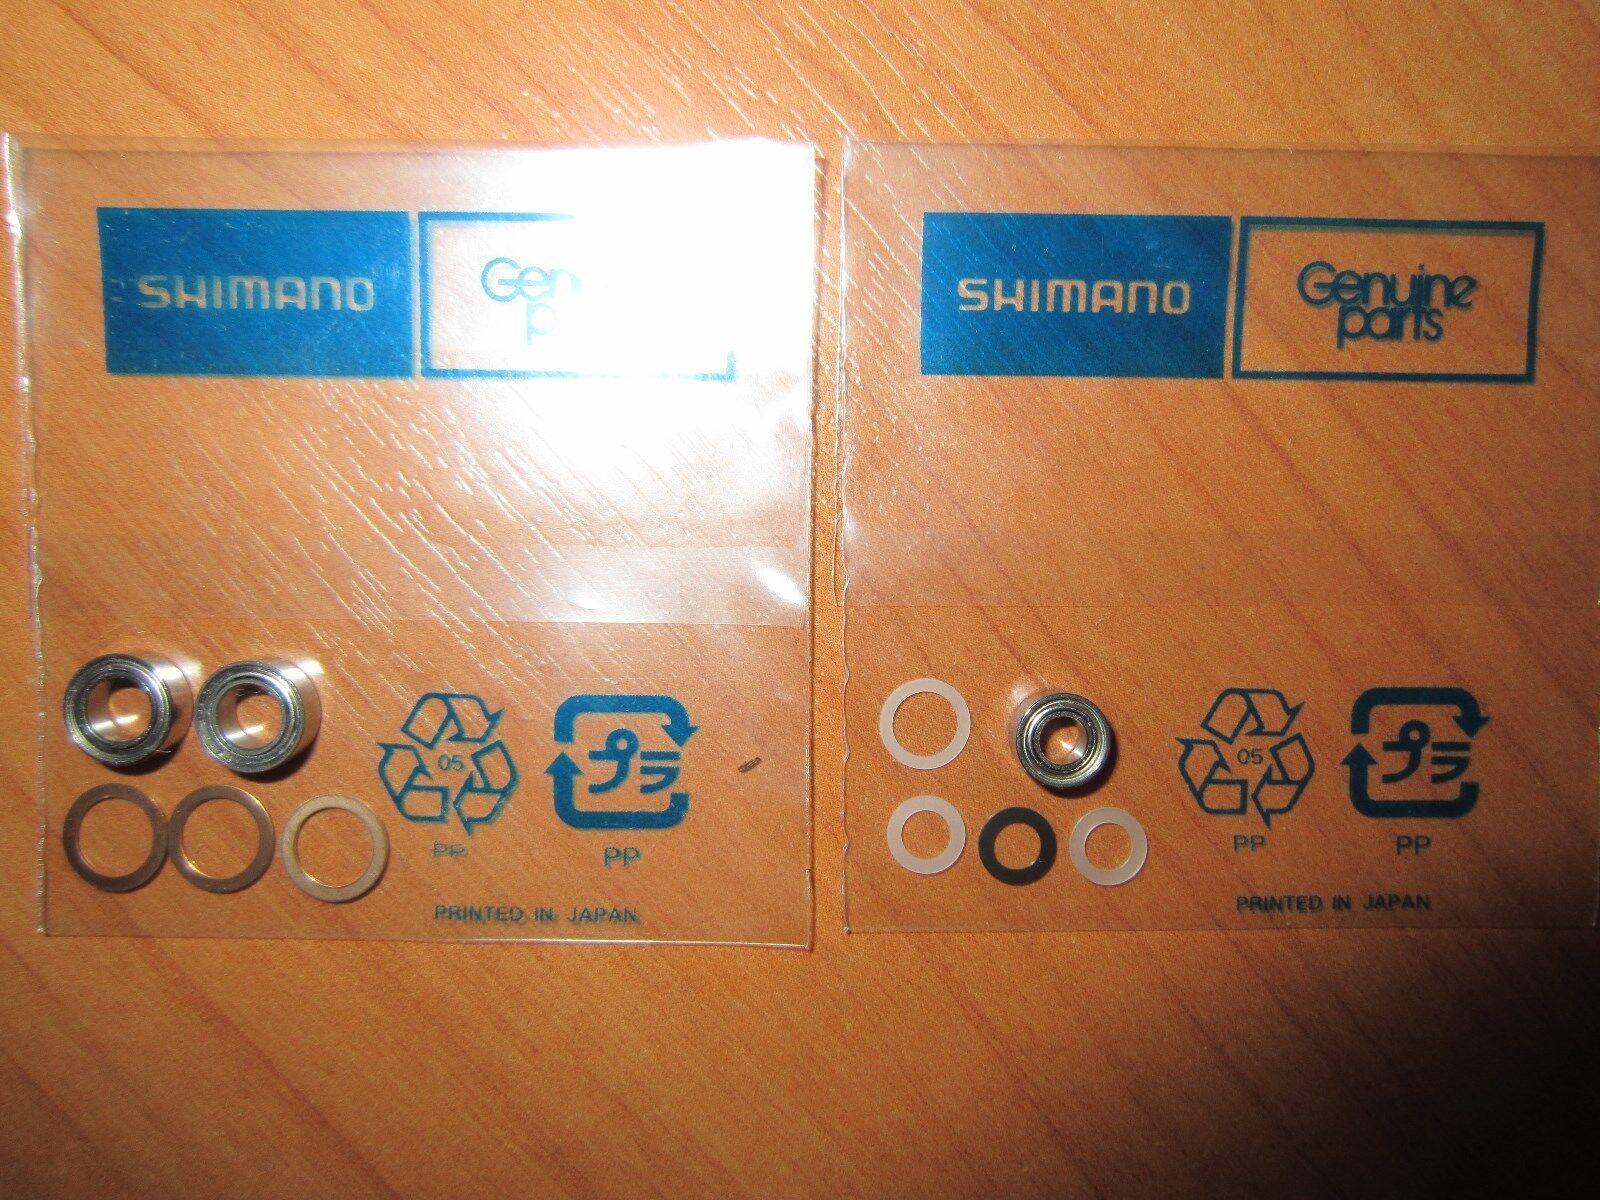 Shimano  Ultegra 2500 C3000 4000 1000 Worm Shaft Handle Knob 3 Ball Bearing Kit  new branded